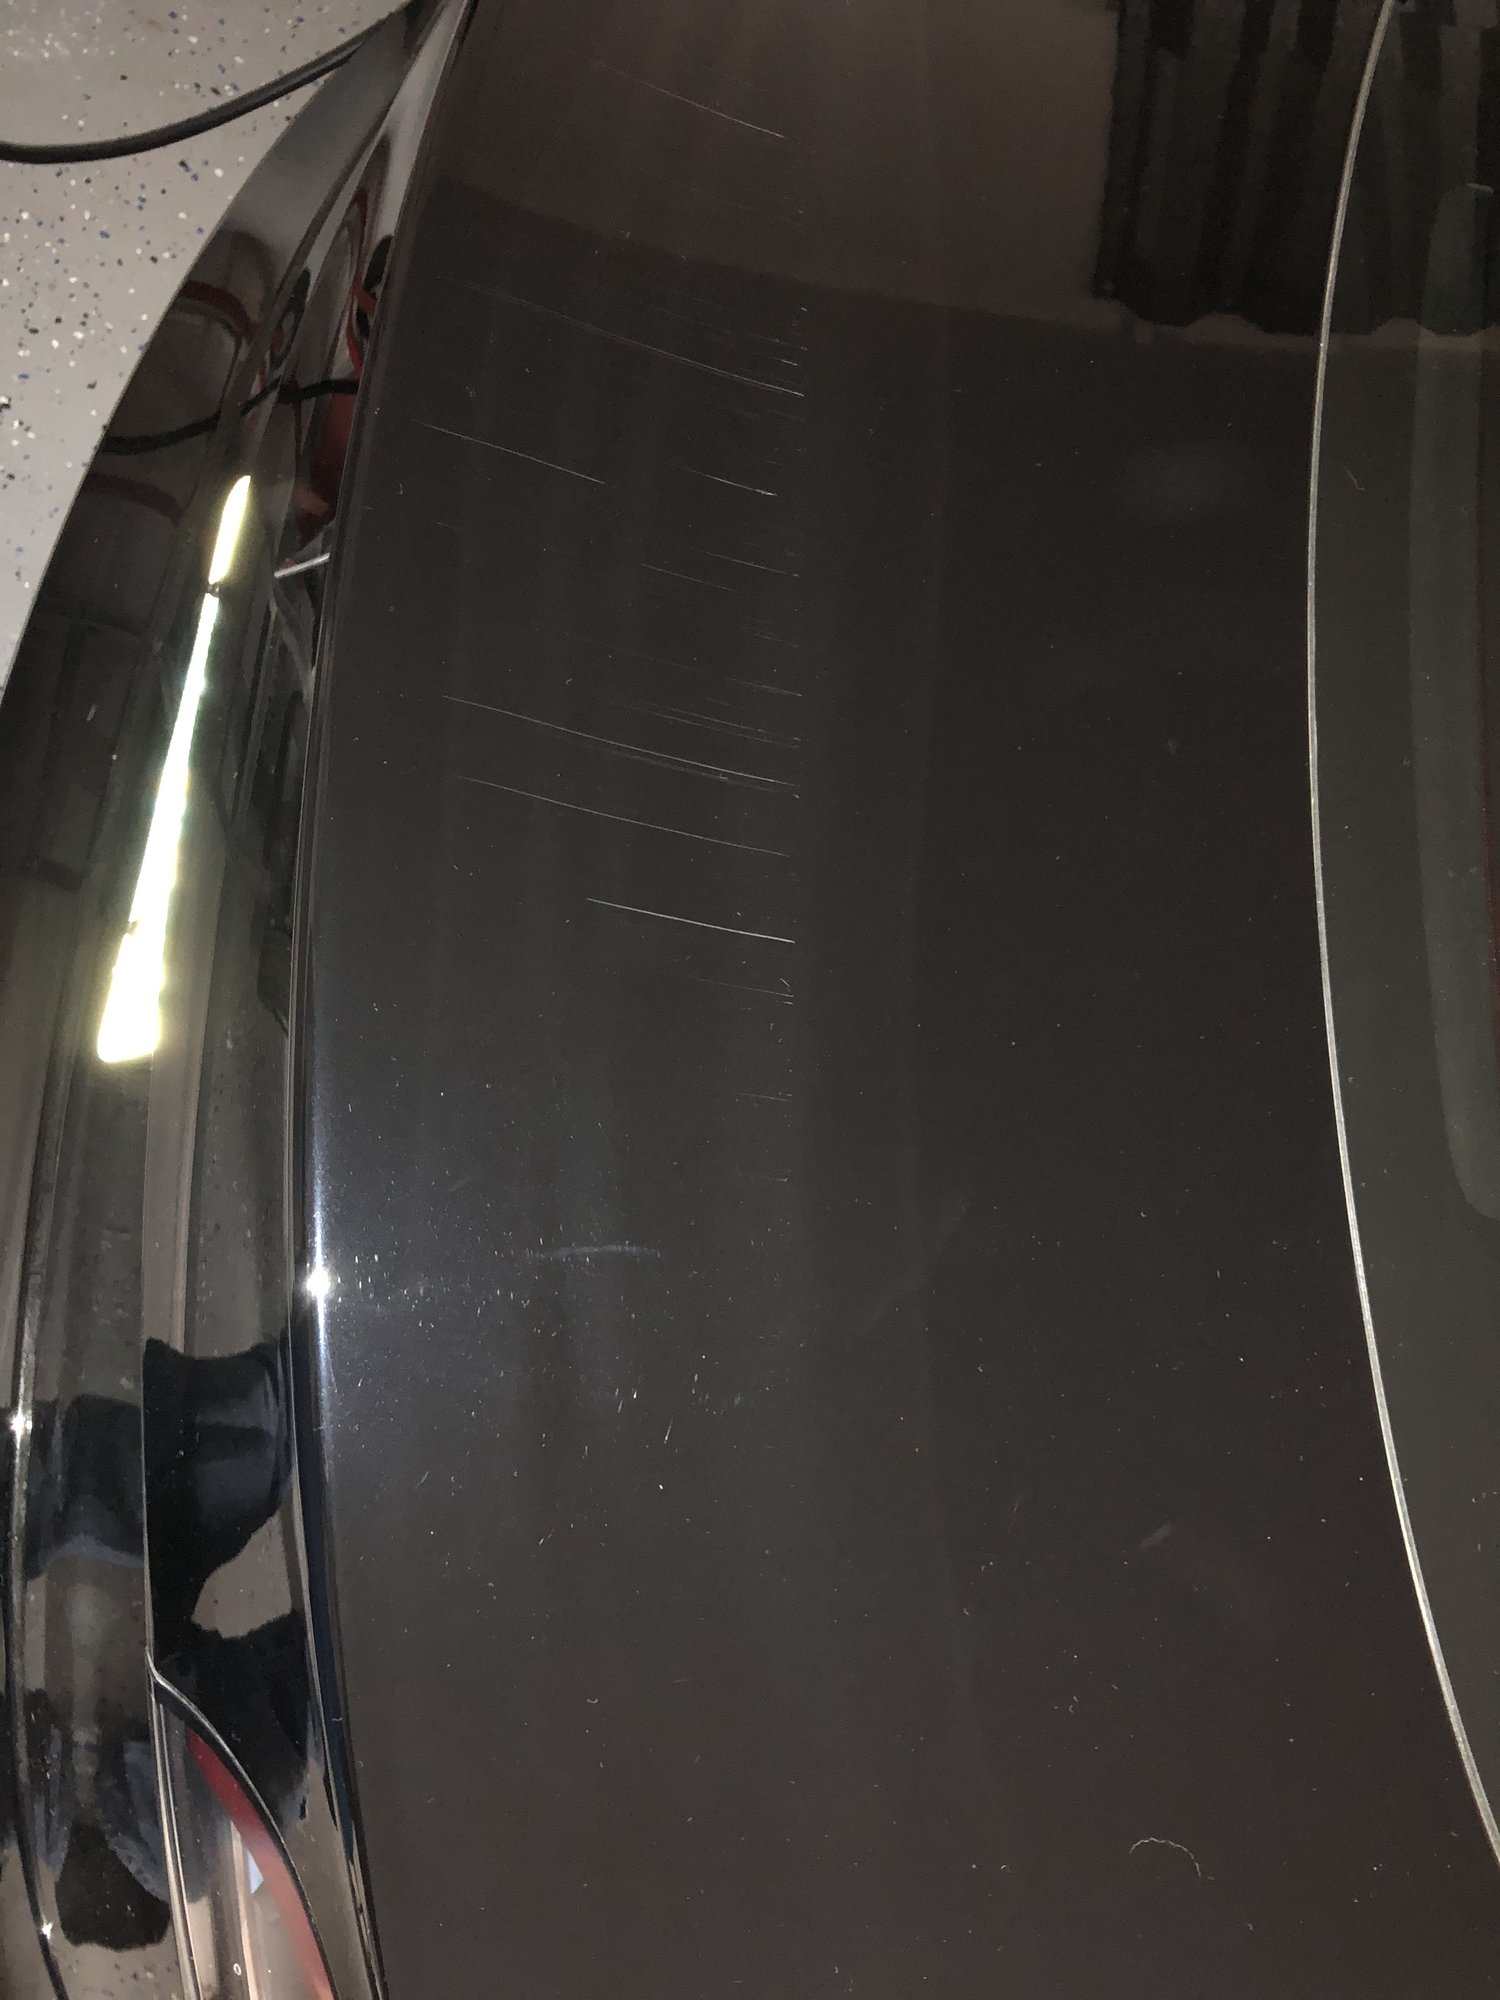 Rtrunk-garage-scrape.jpg